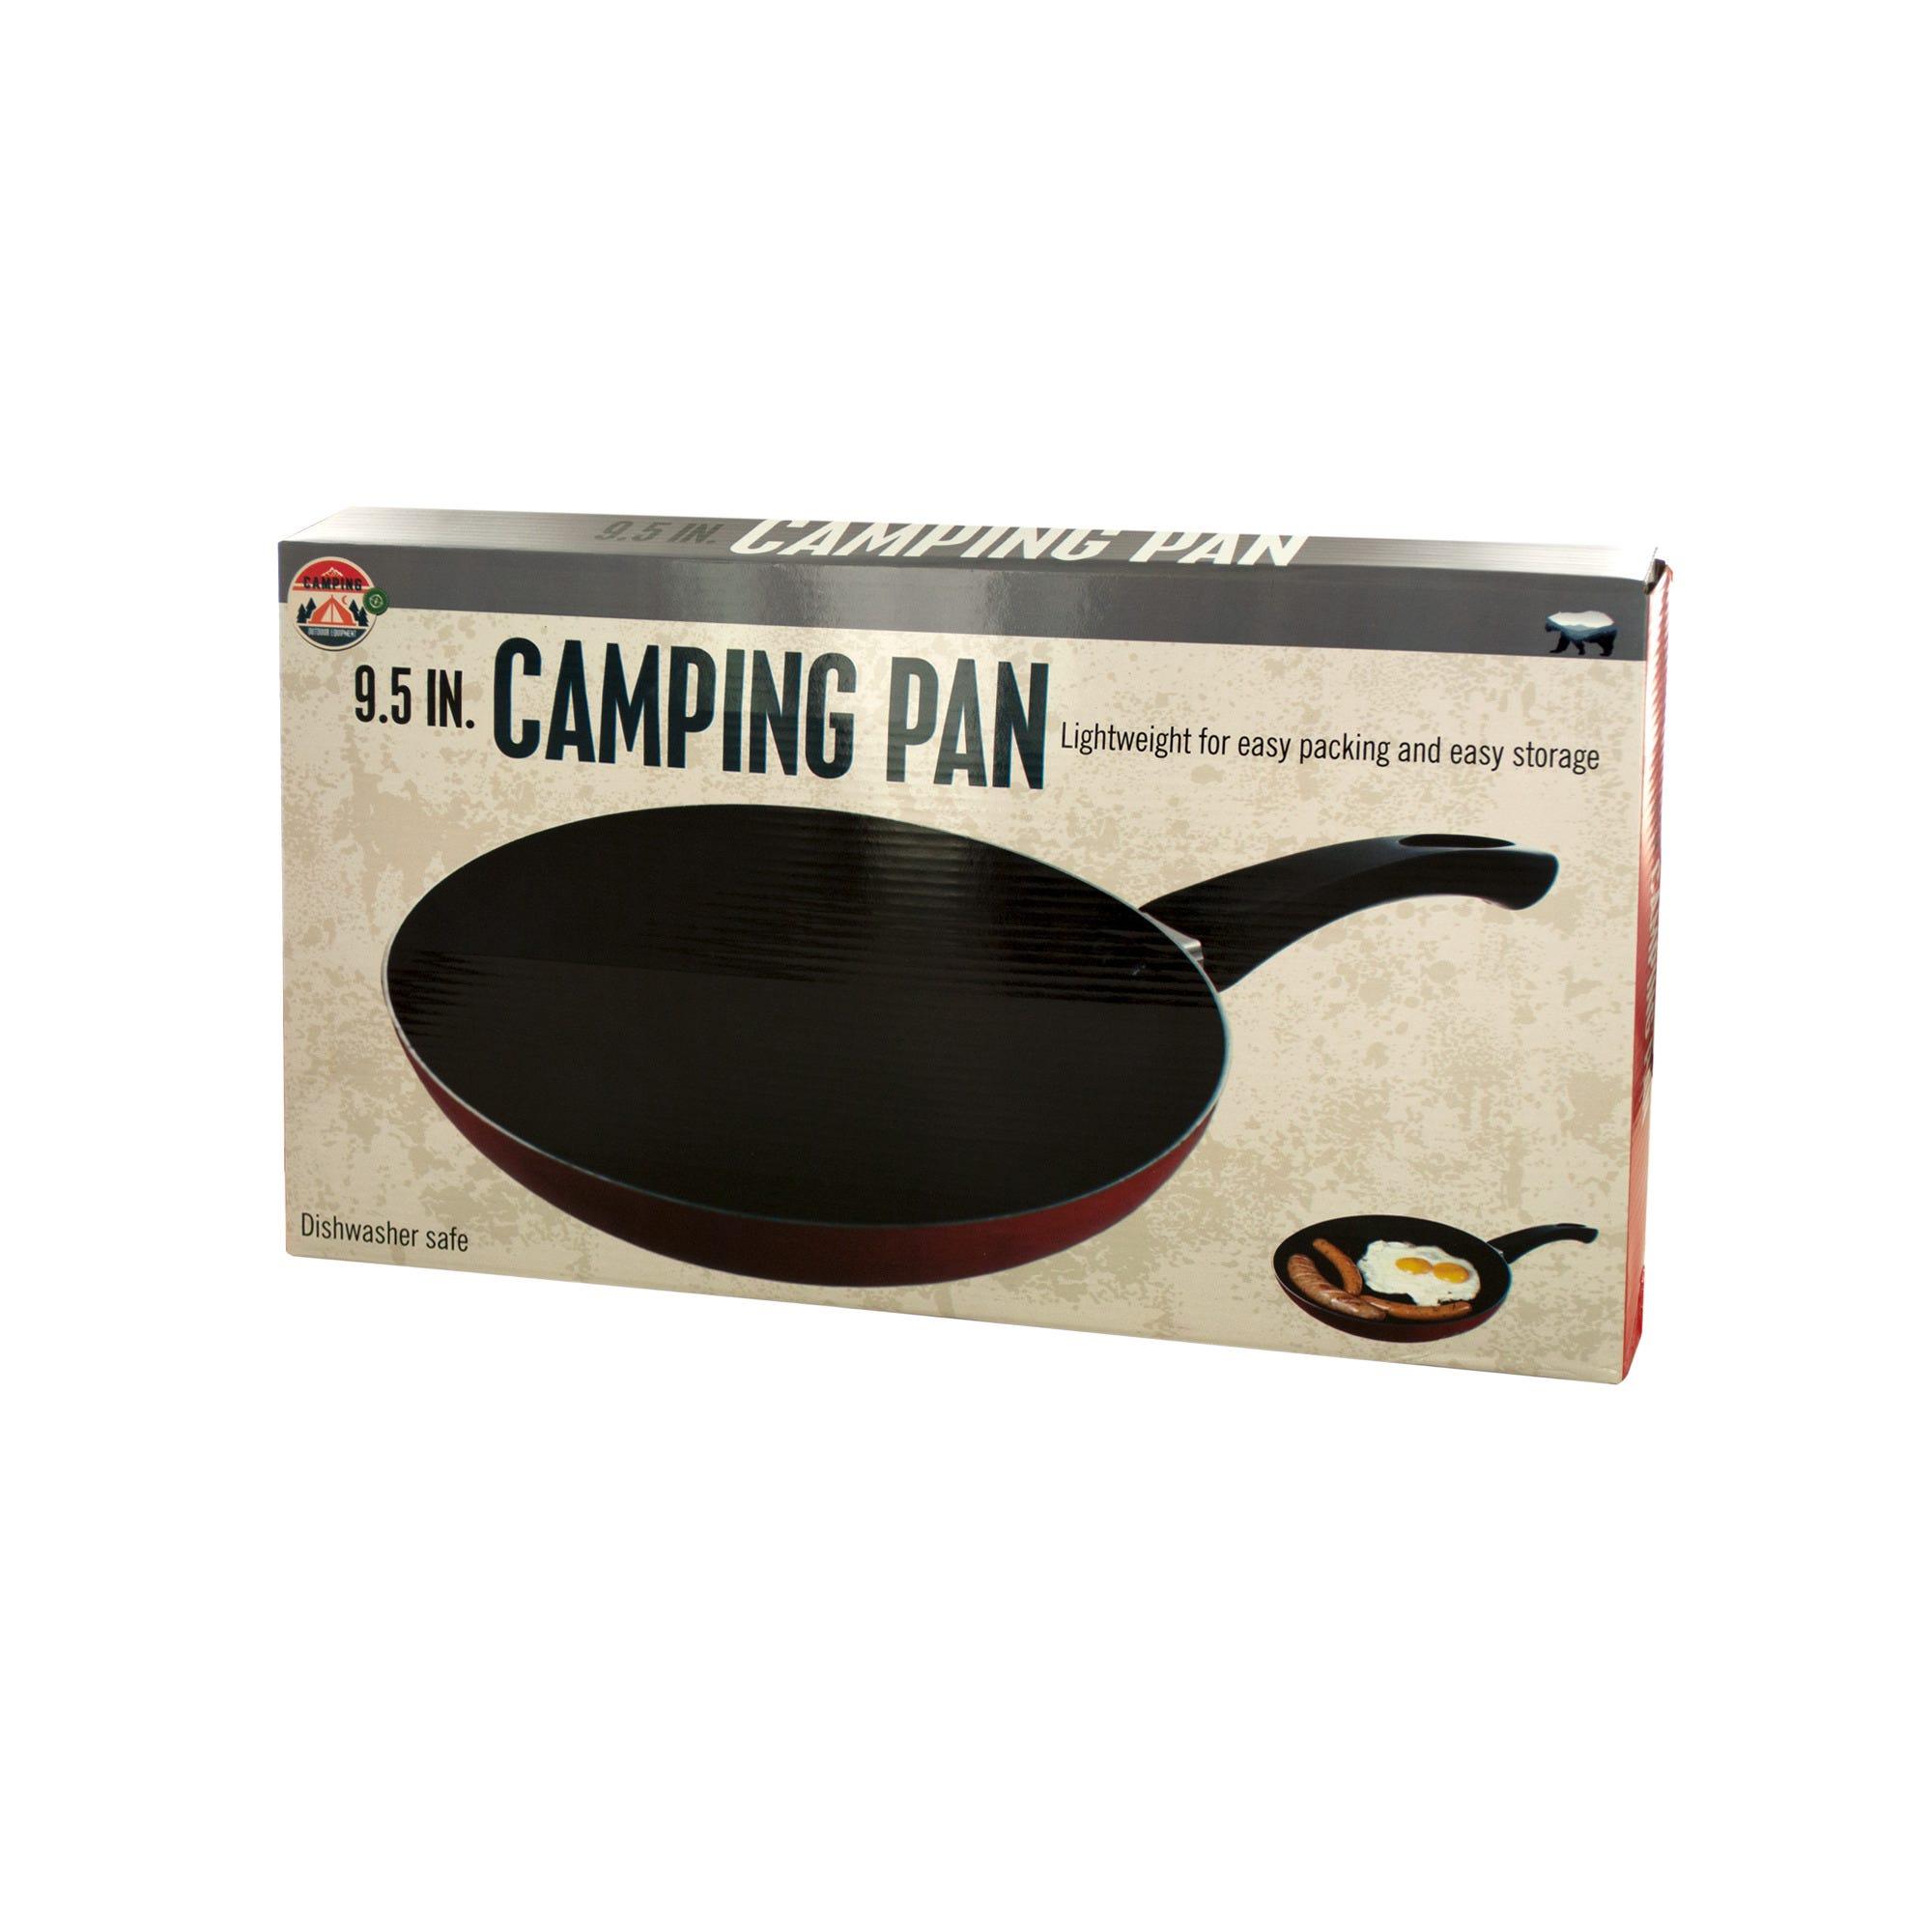 Lightweight Camping Pan- Qty 4